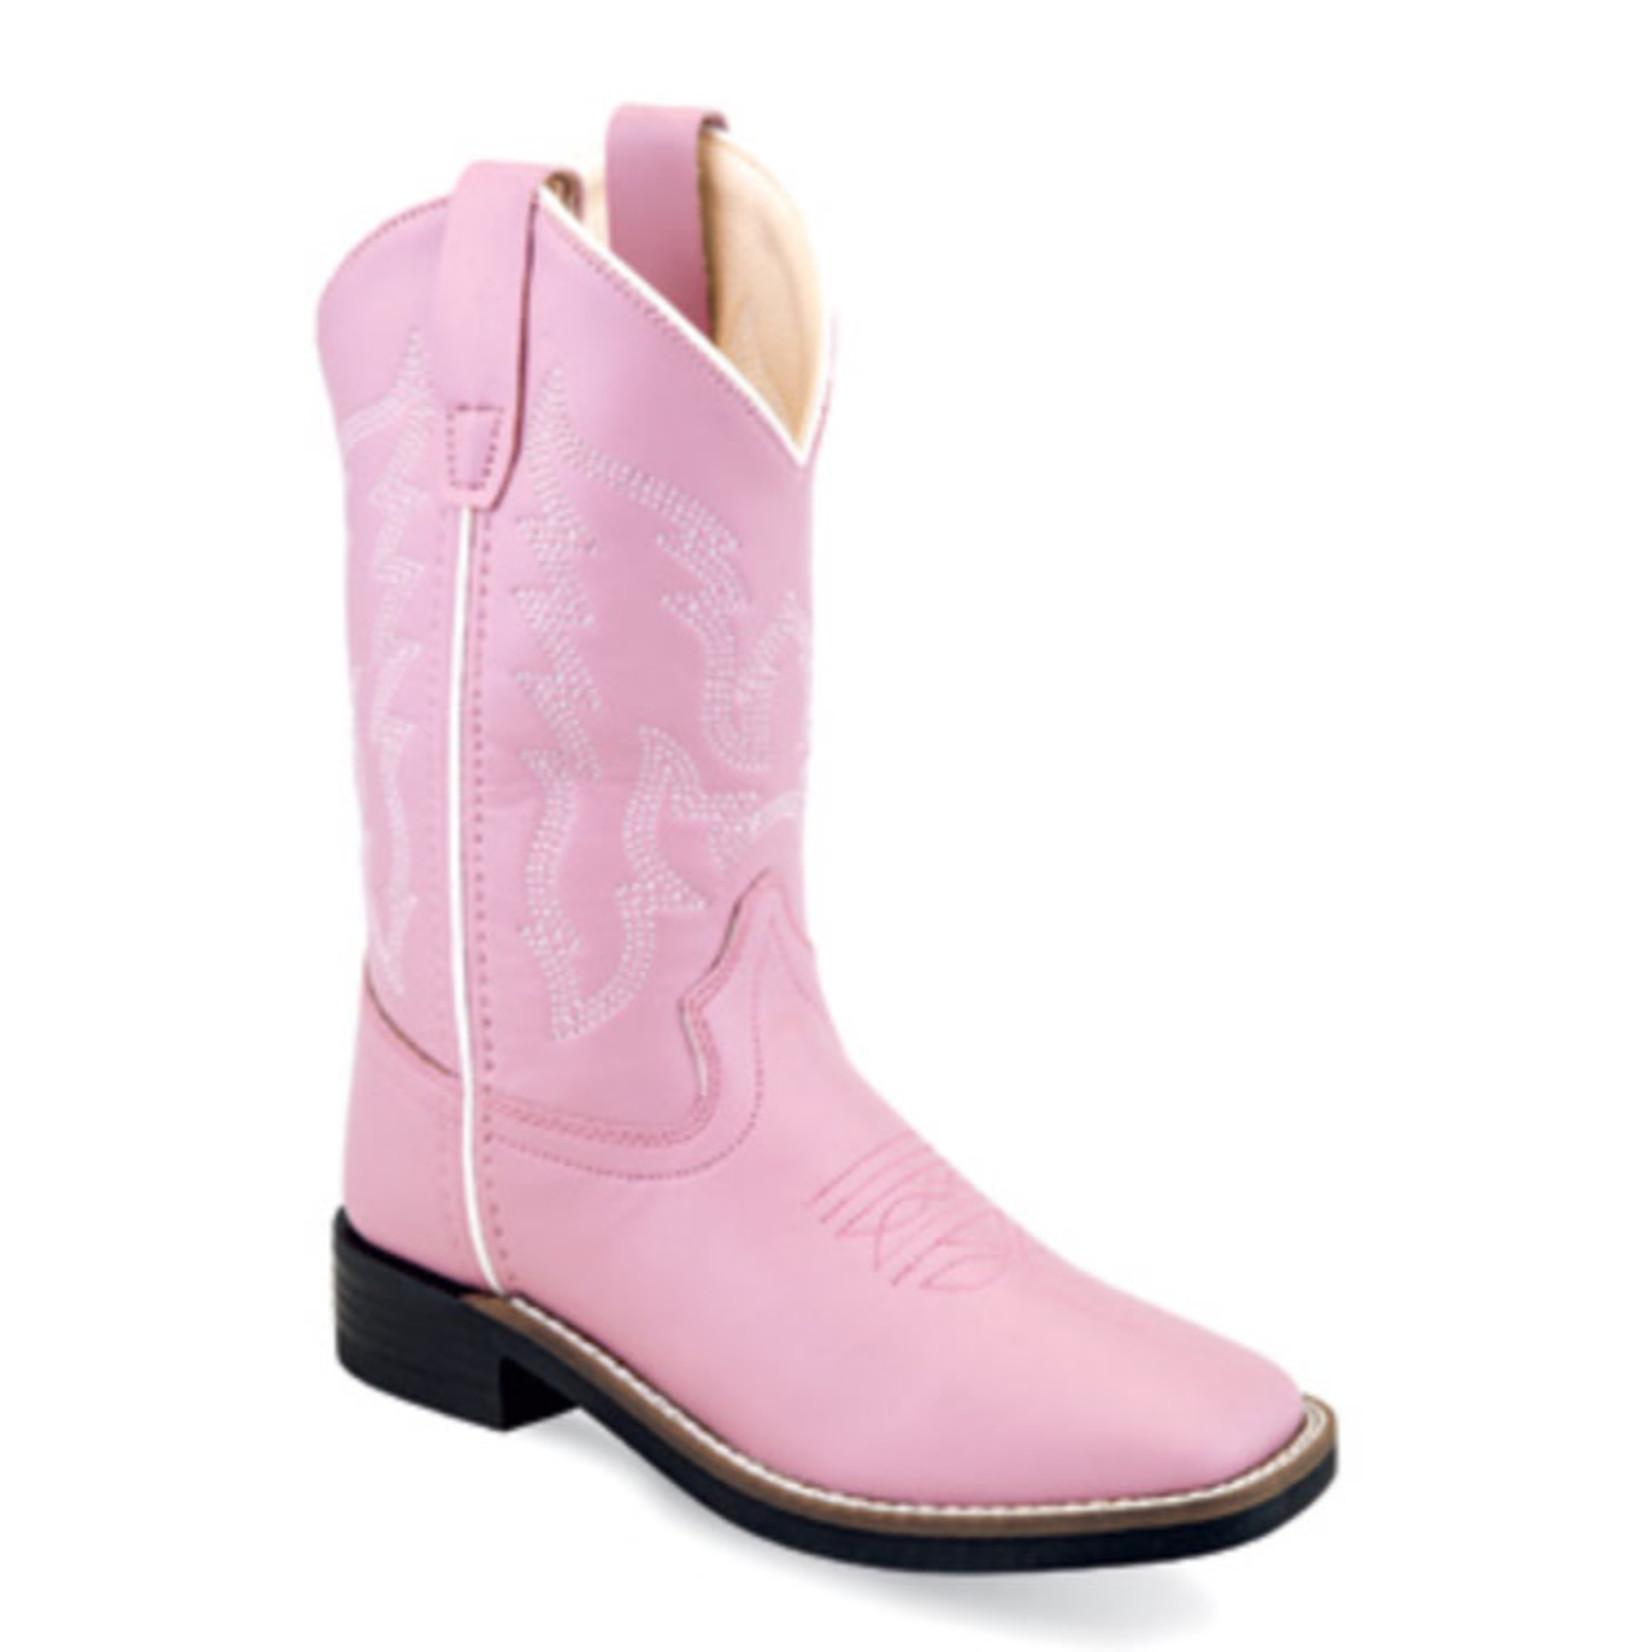 Old west Old West Children Pink Square Toe Western Boot VB9131